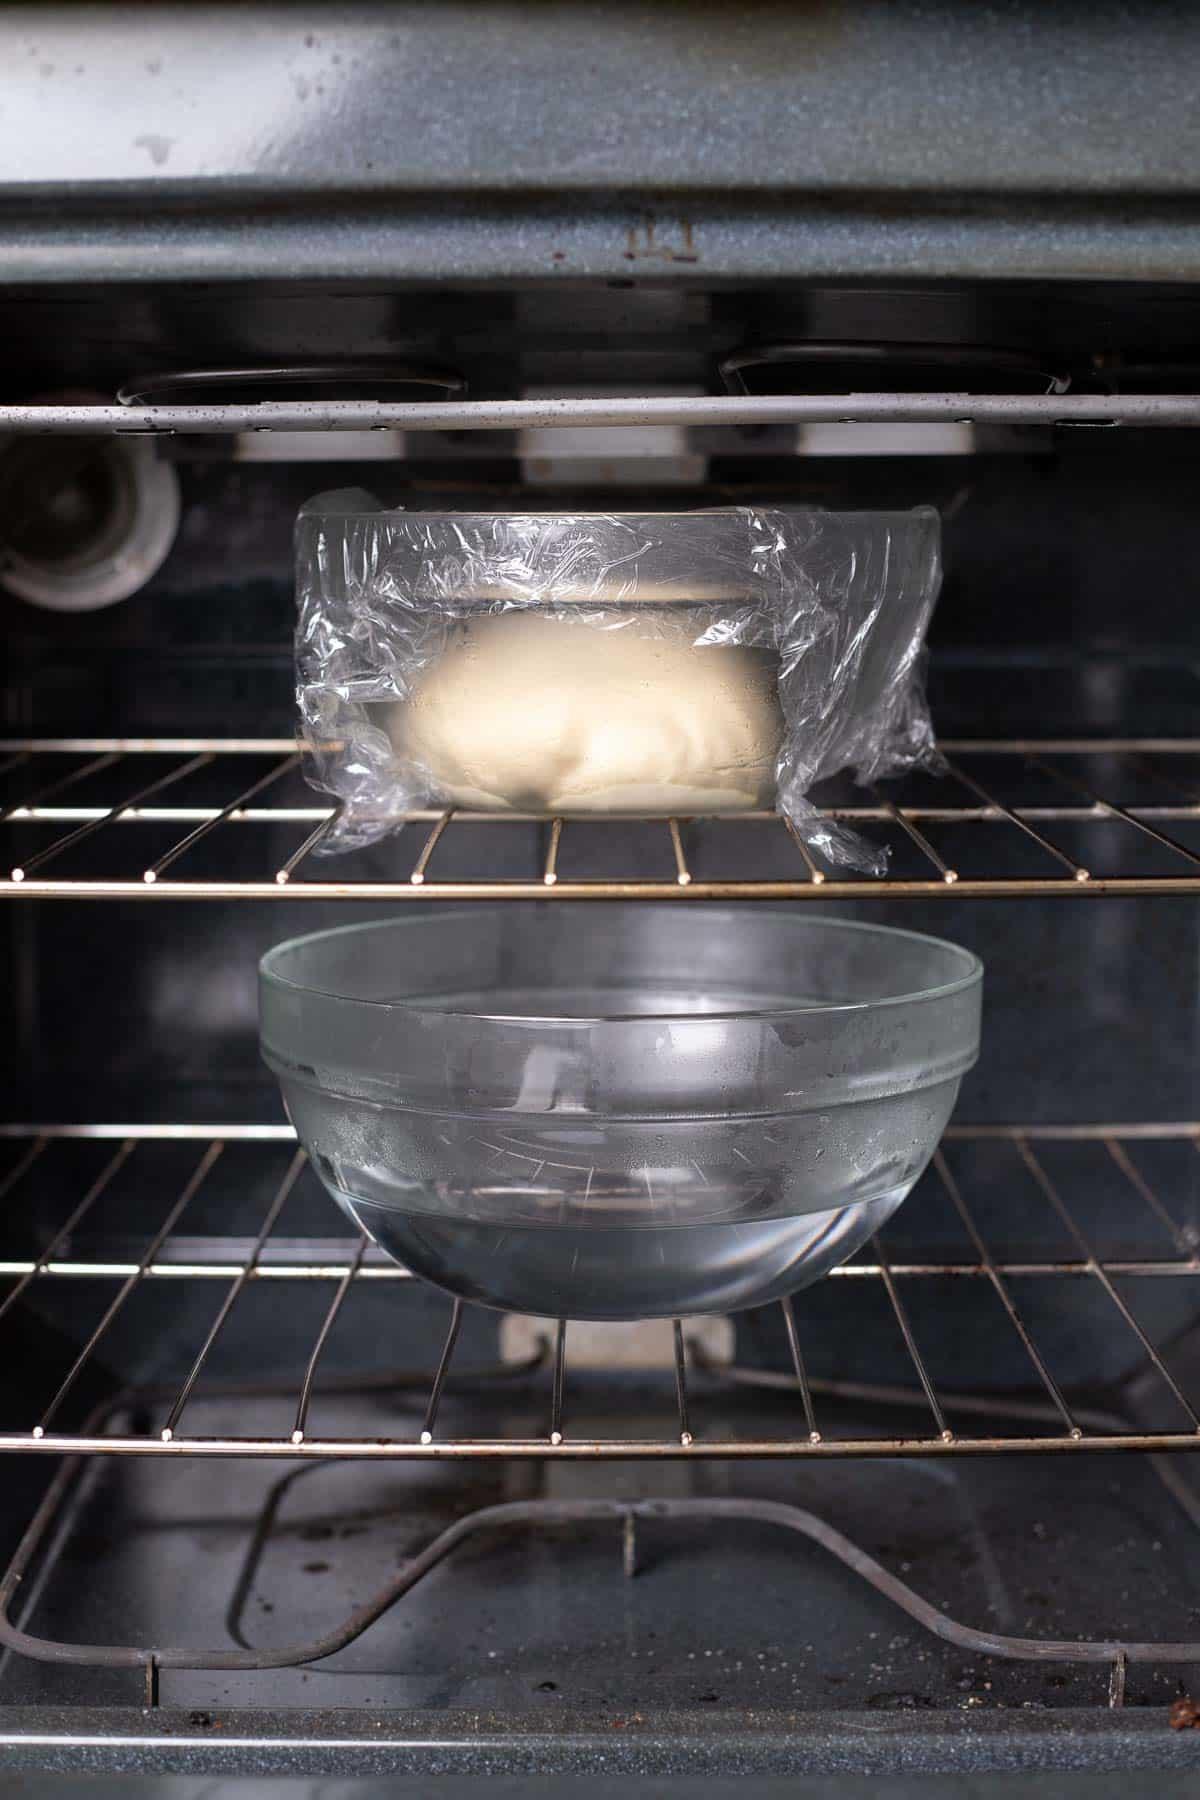 parmesan bread bite dough bowl in the oven.